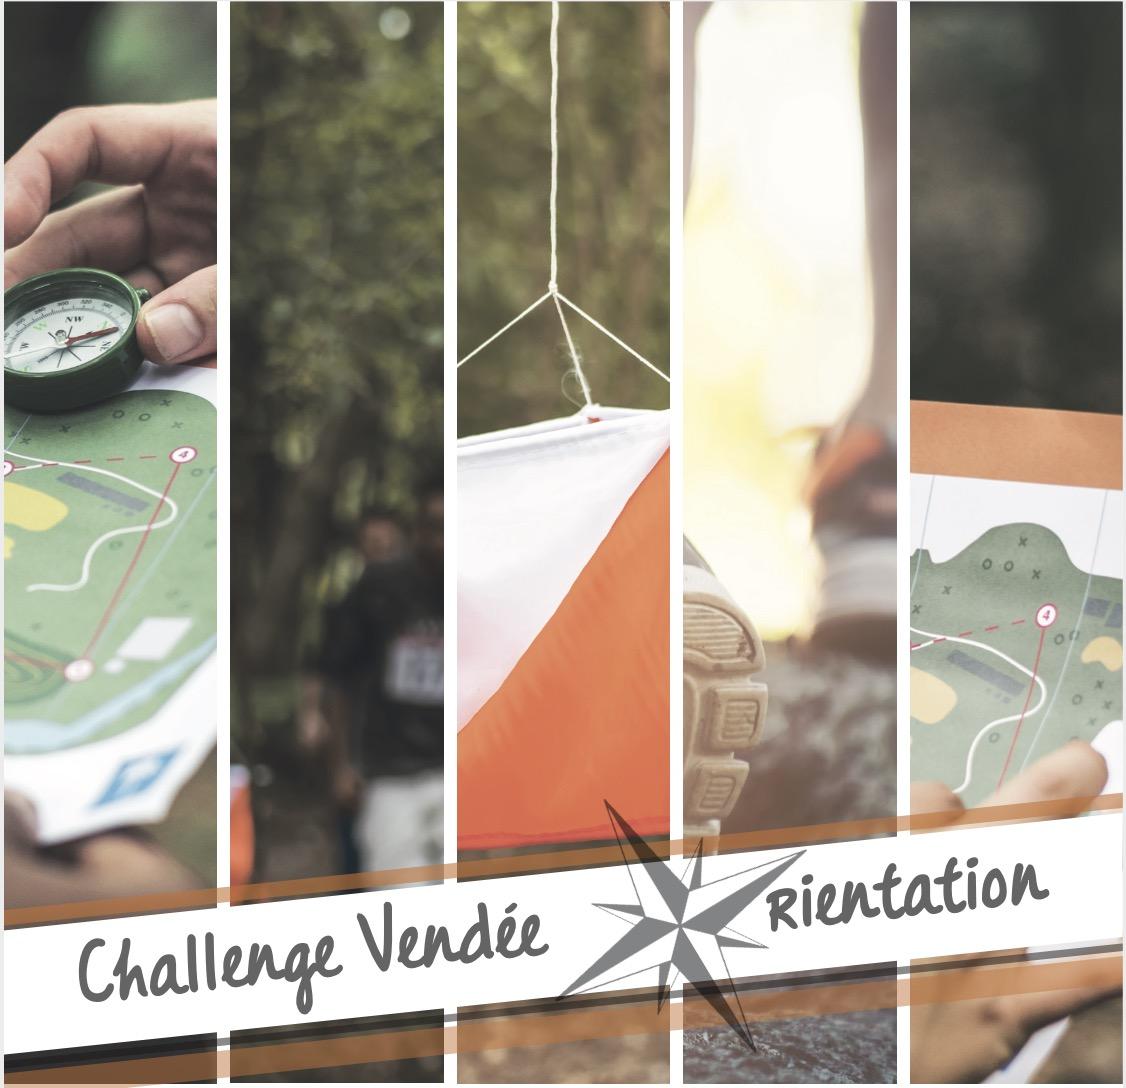 Challenge Vendée Orientation